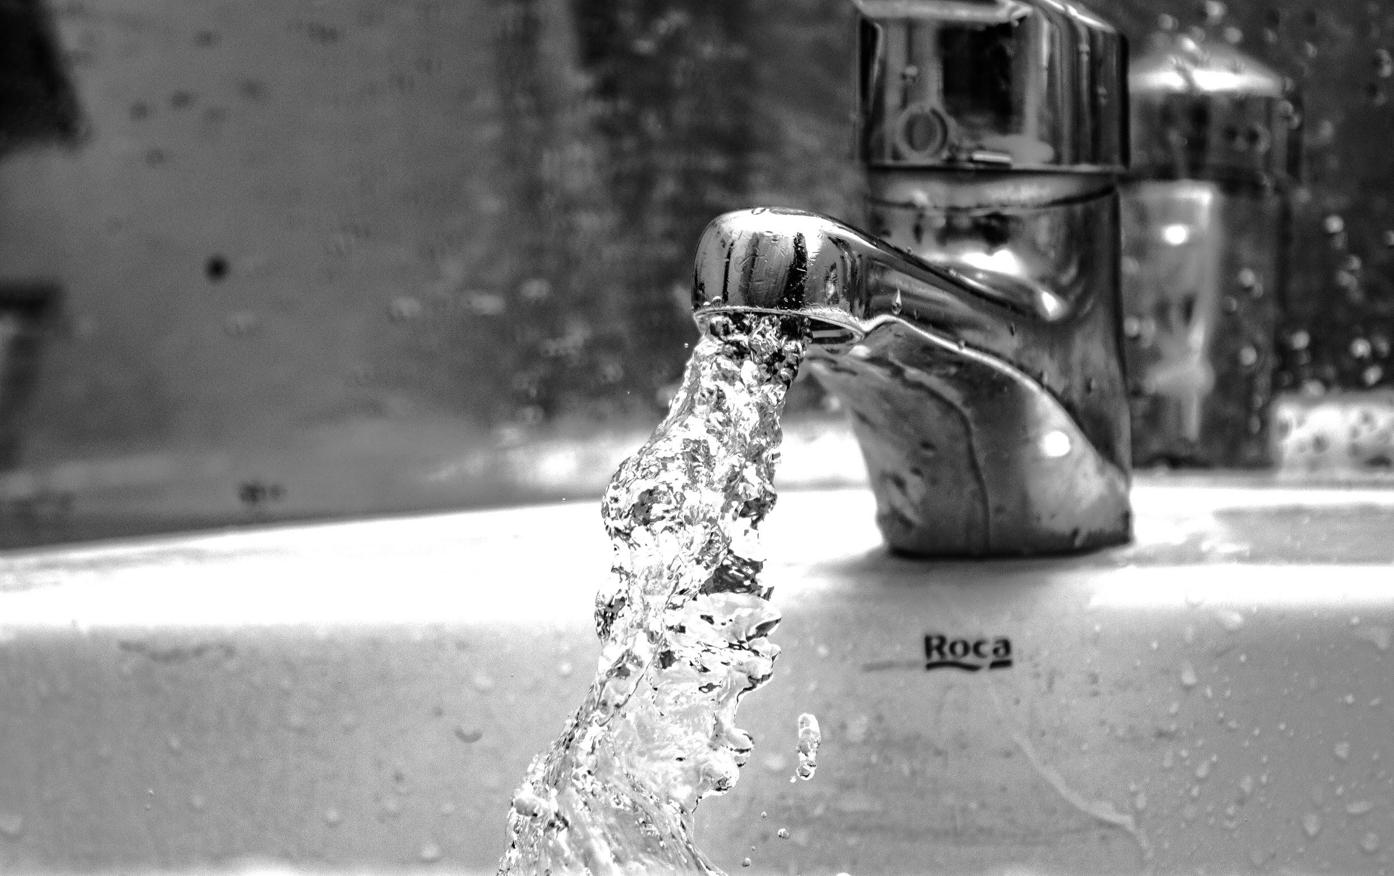 Image by Tosab Photography, via Unsplash.com.